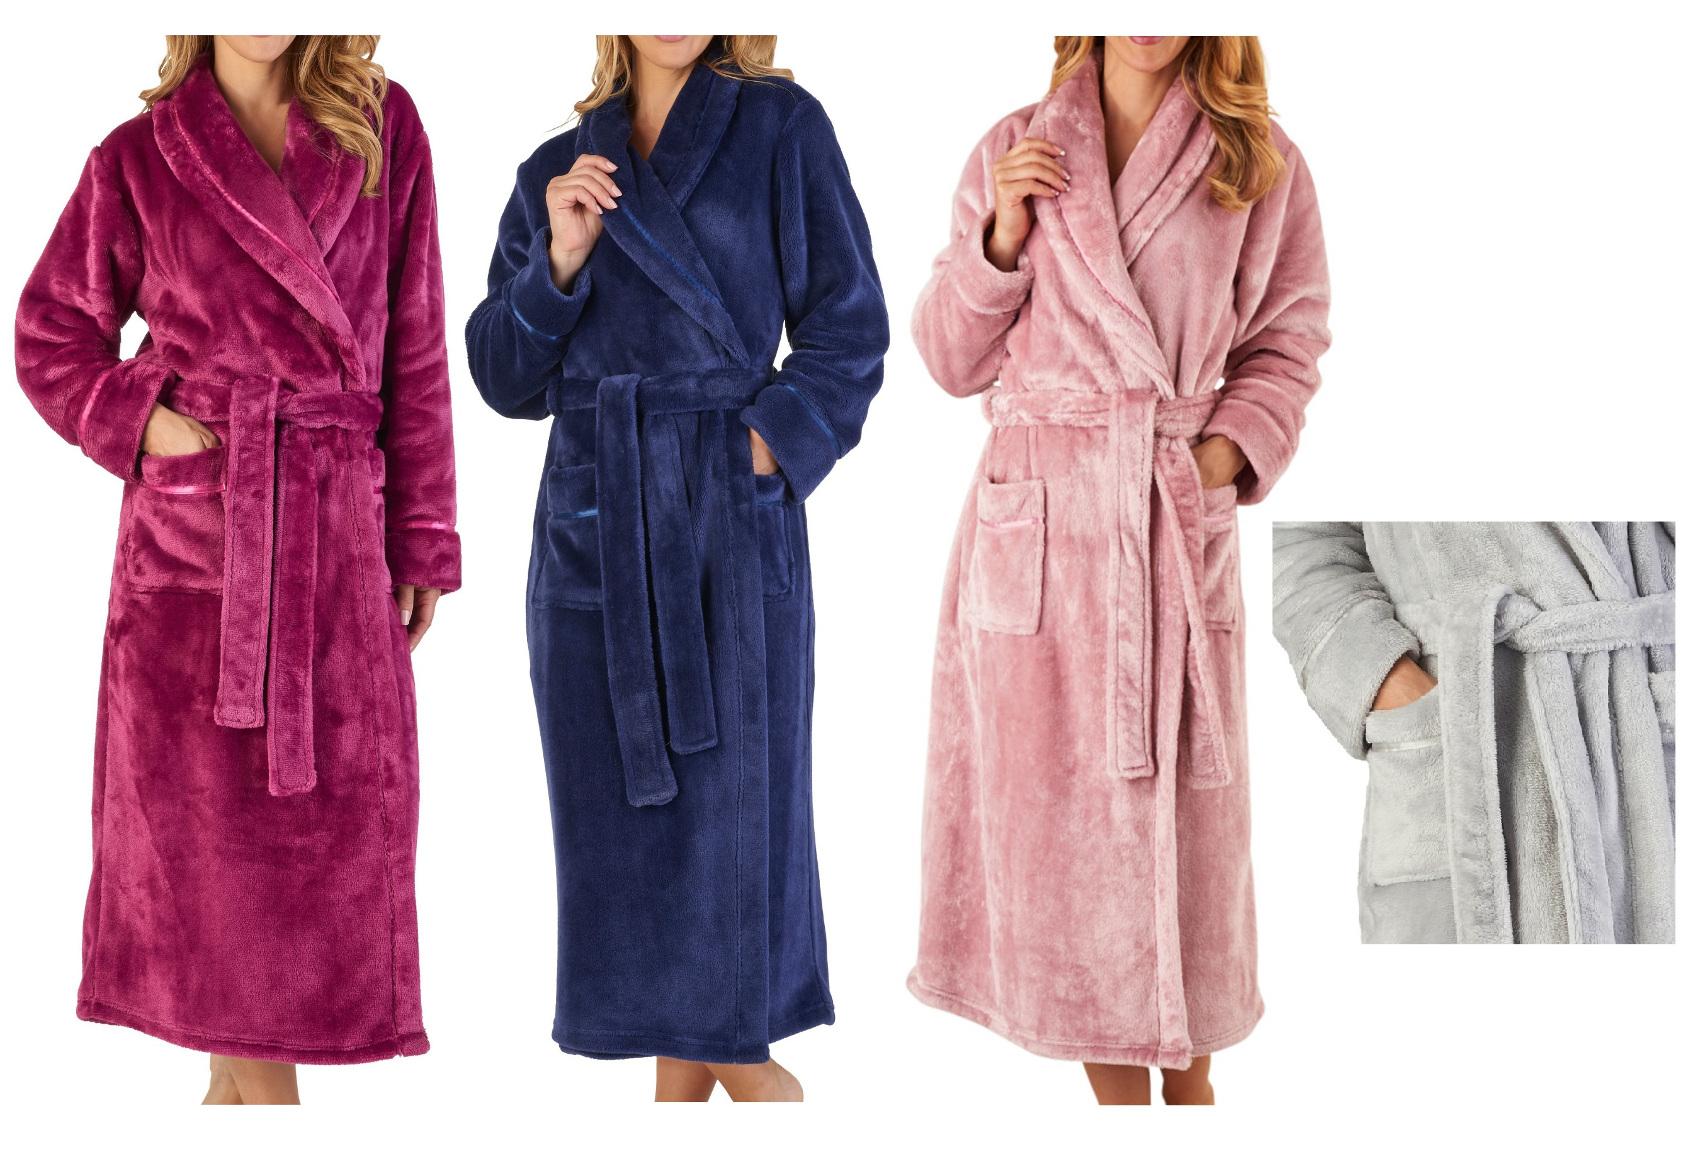 Slenderella Womens Luxury Thick Flannel Fleece Dressing Gown Shawl ... 0960cff83